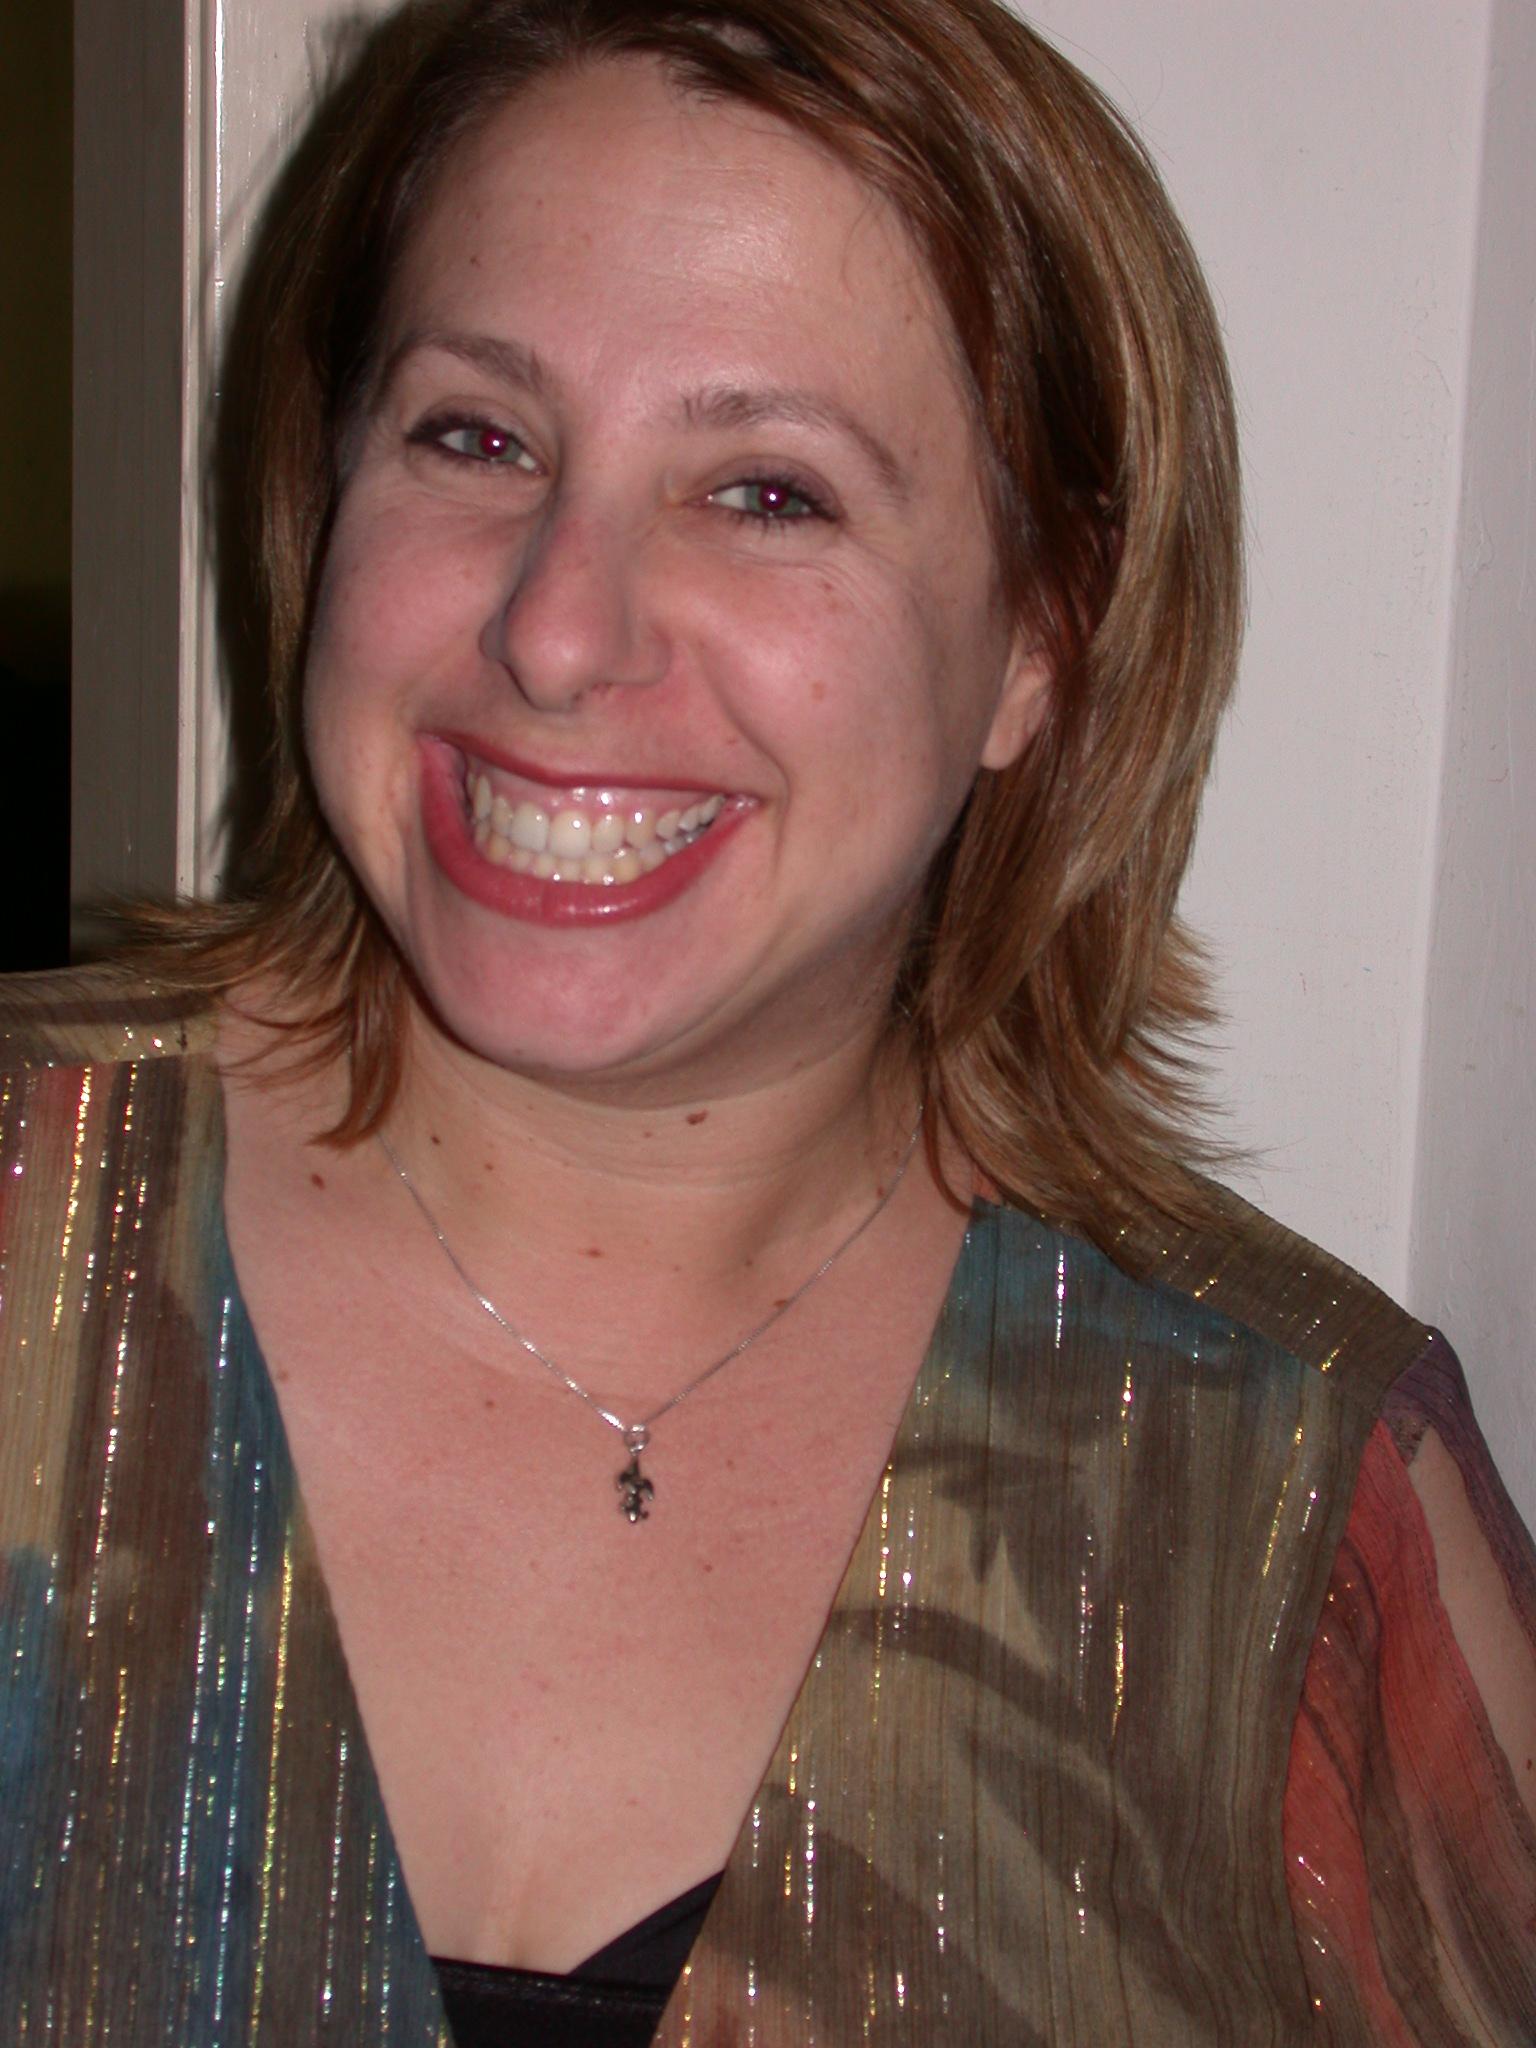 Heidi Smiling